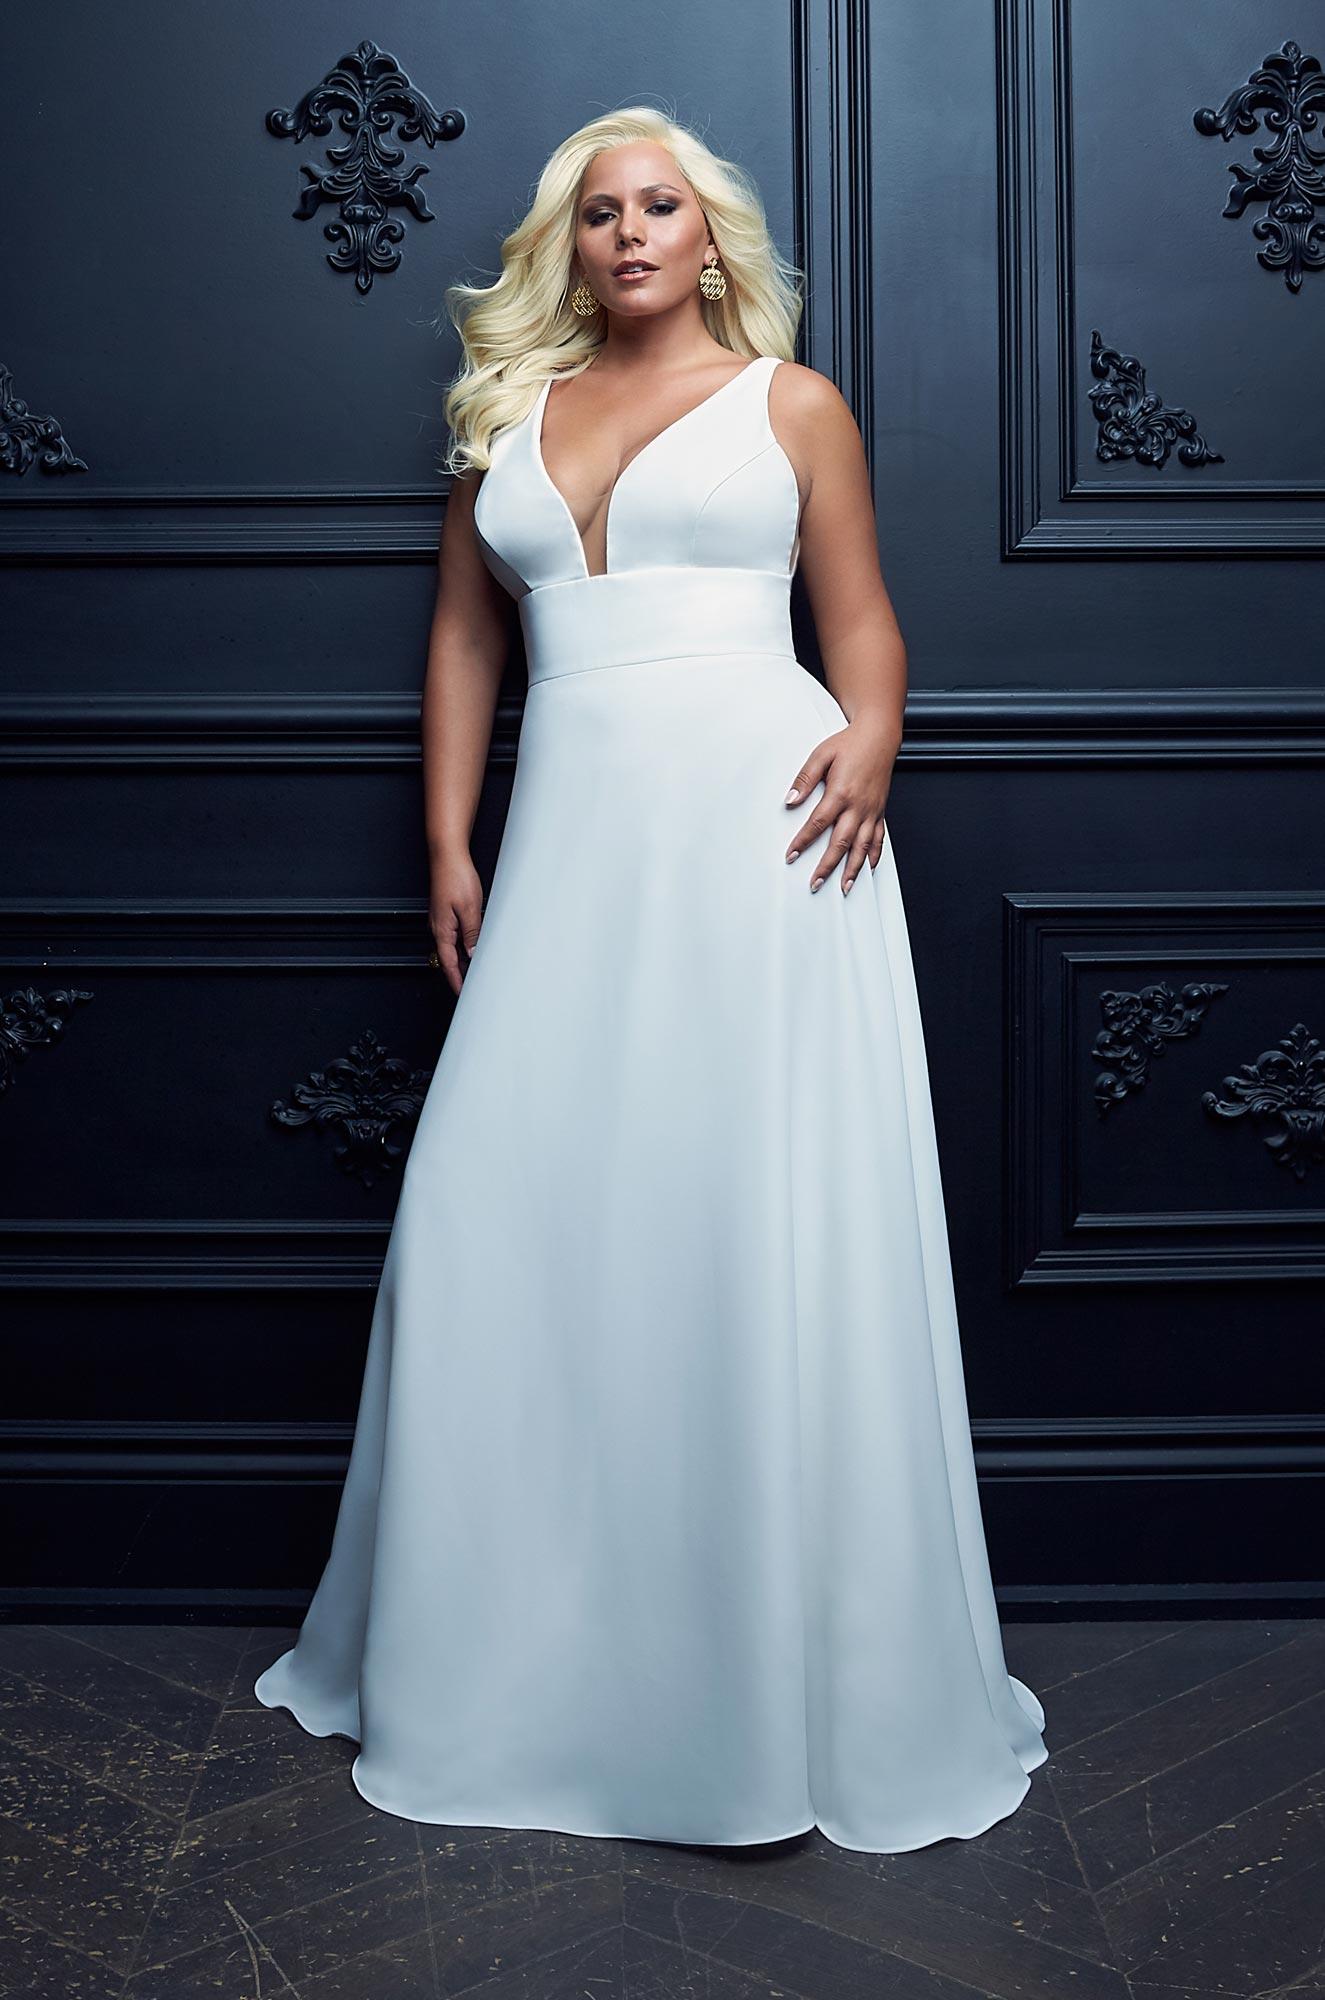 Full Skirt Crepe Wedding Dress - Style #4962 | Paloma Blanca